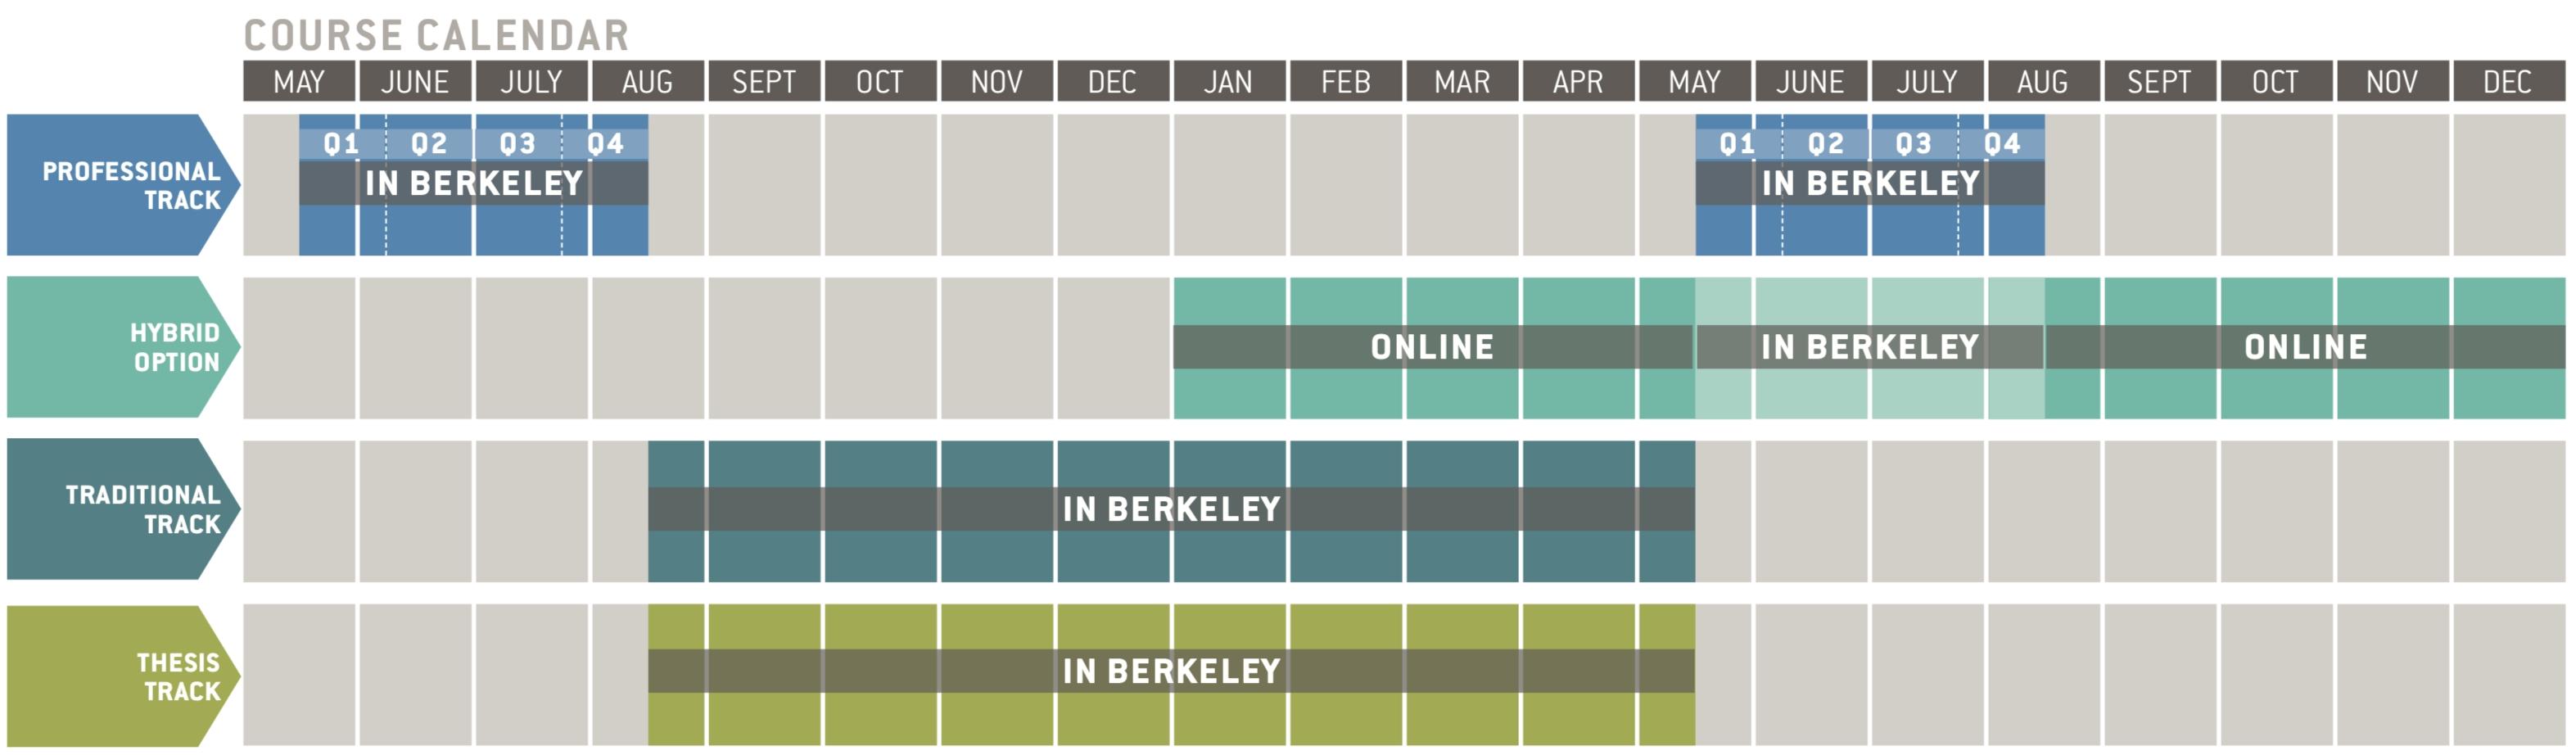 Landing Ll.m. Hybrid Option | Berkeley Law Uc Berkeley Academic Calendar 2019 20